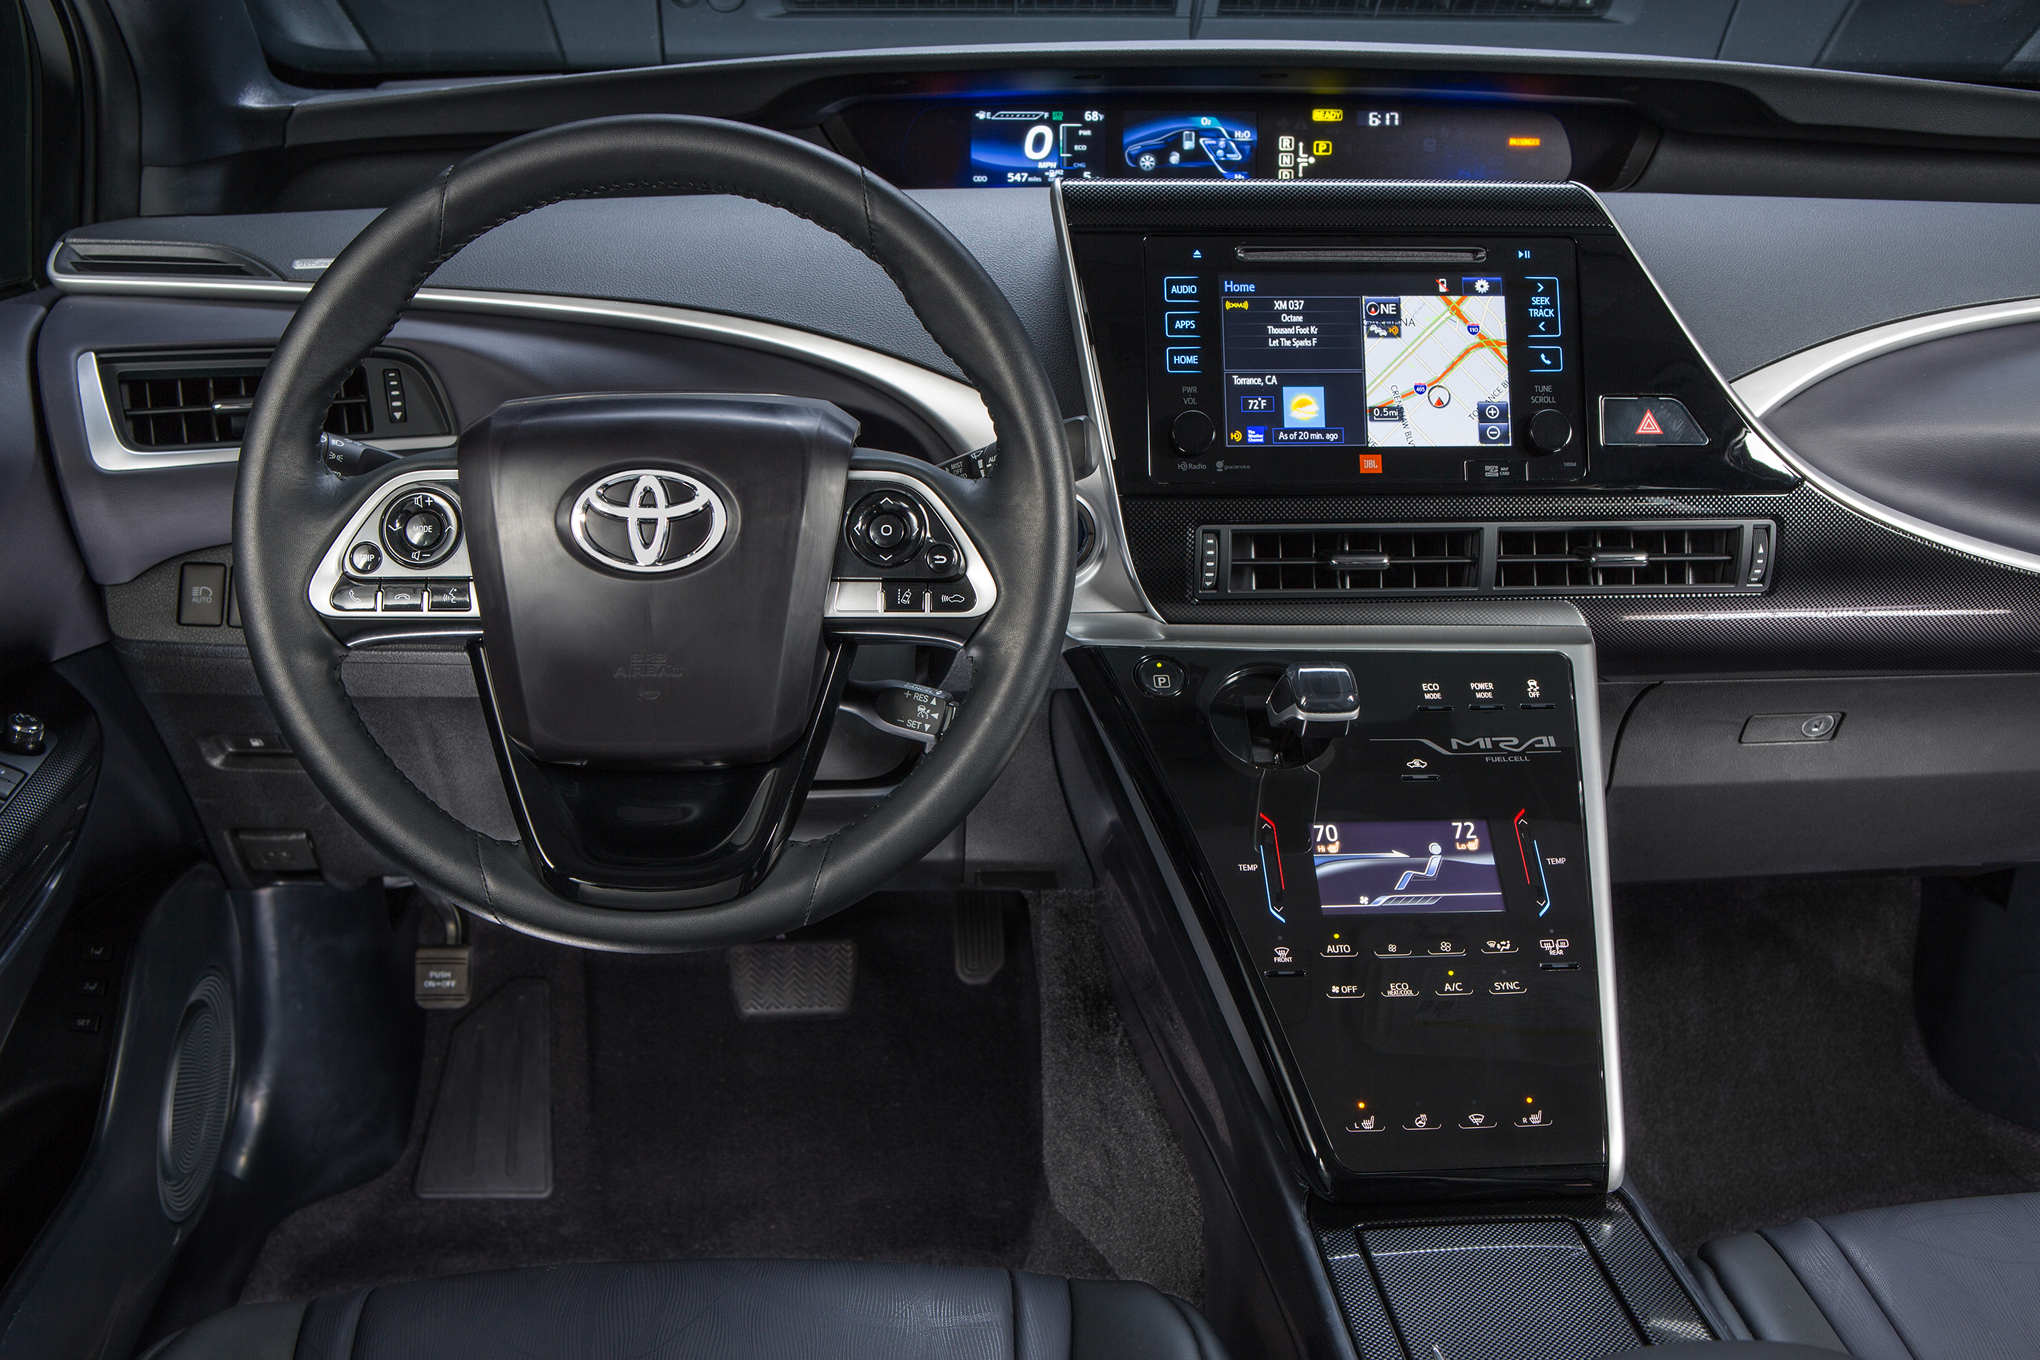 2016 Toyota Mirai Cockpit and Speedometer